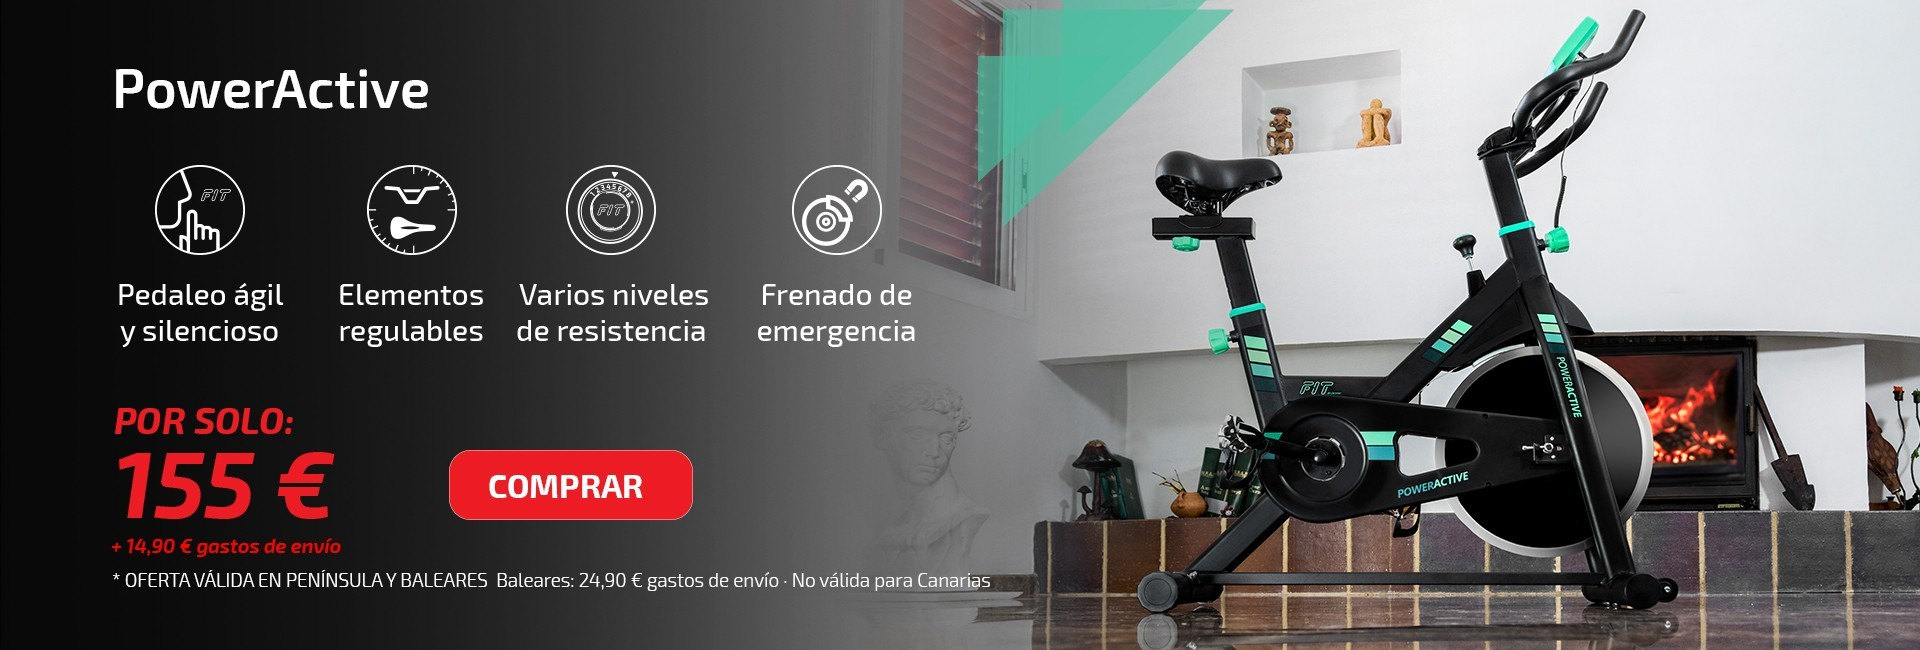 Bicicleta PowerActive